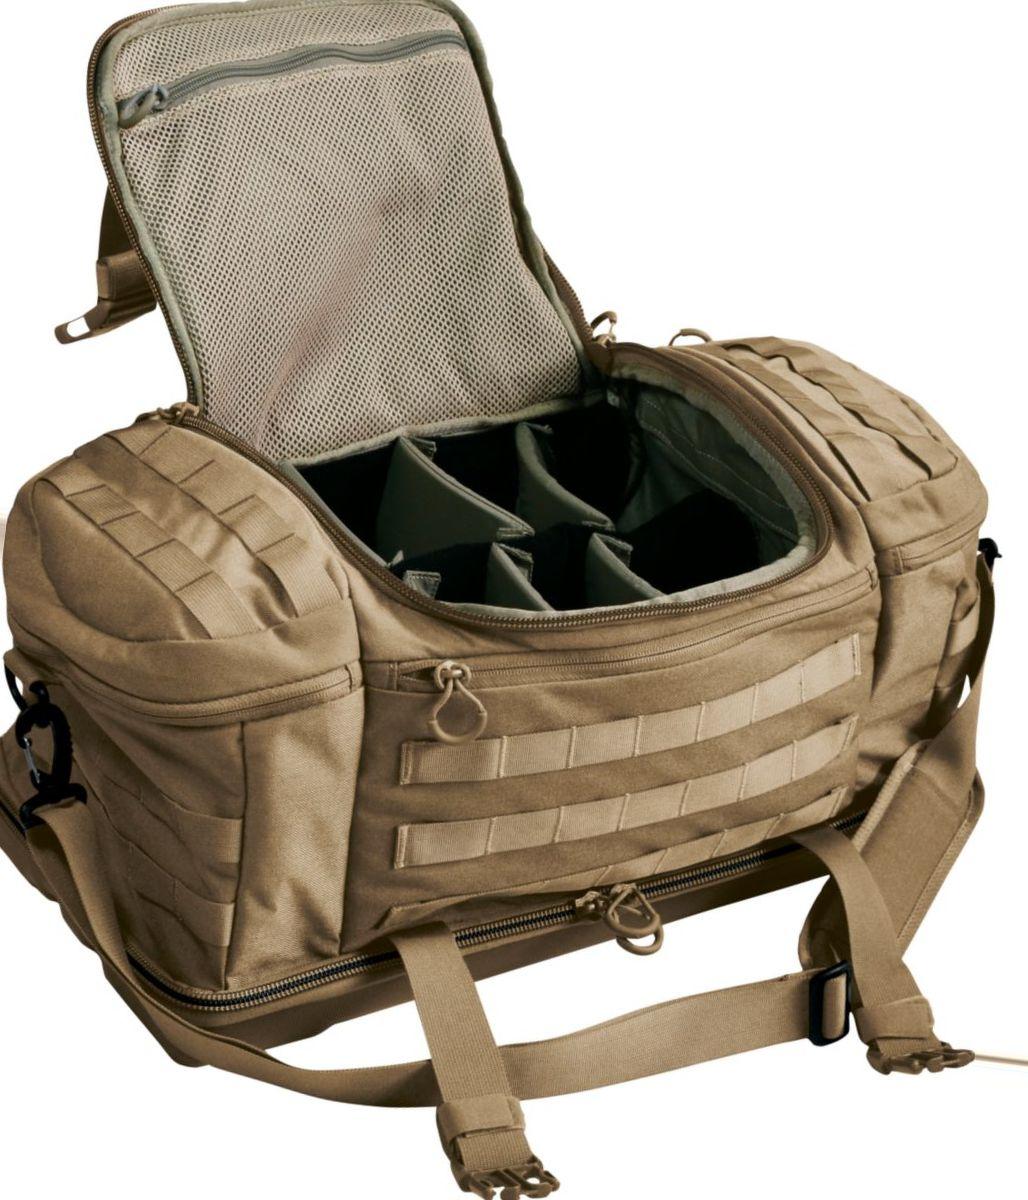 Eberlestock® R1 Range Bag